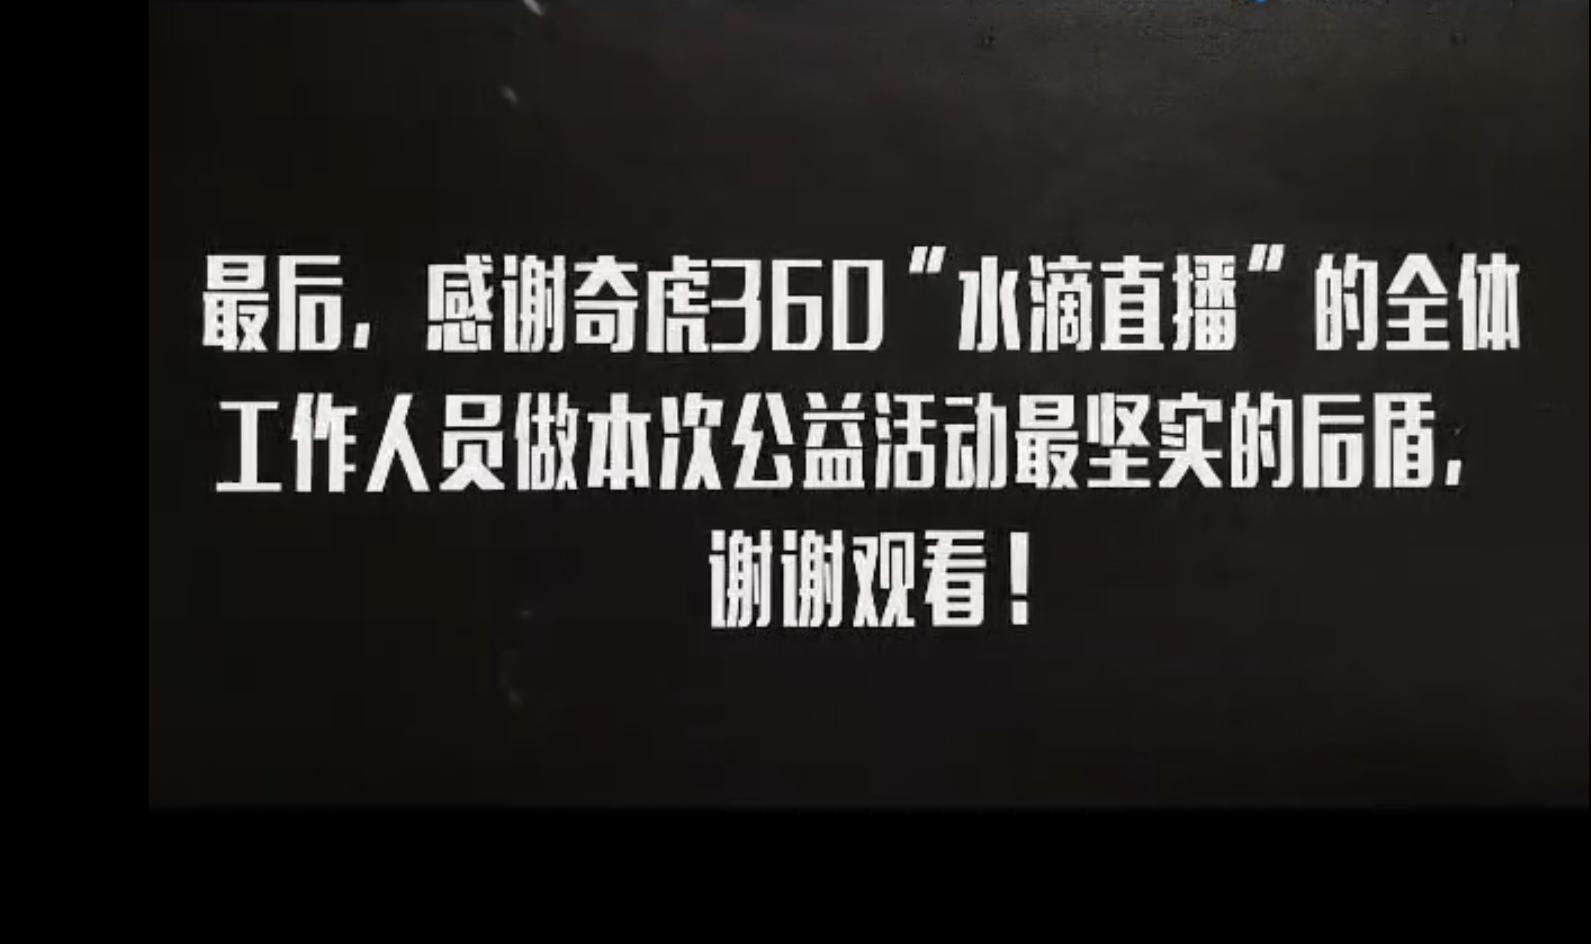 Screenshot_2019-10-30-12-31-18-791_腾讯视频.png